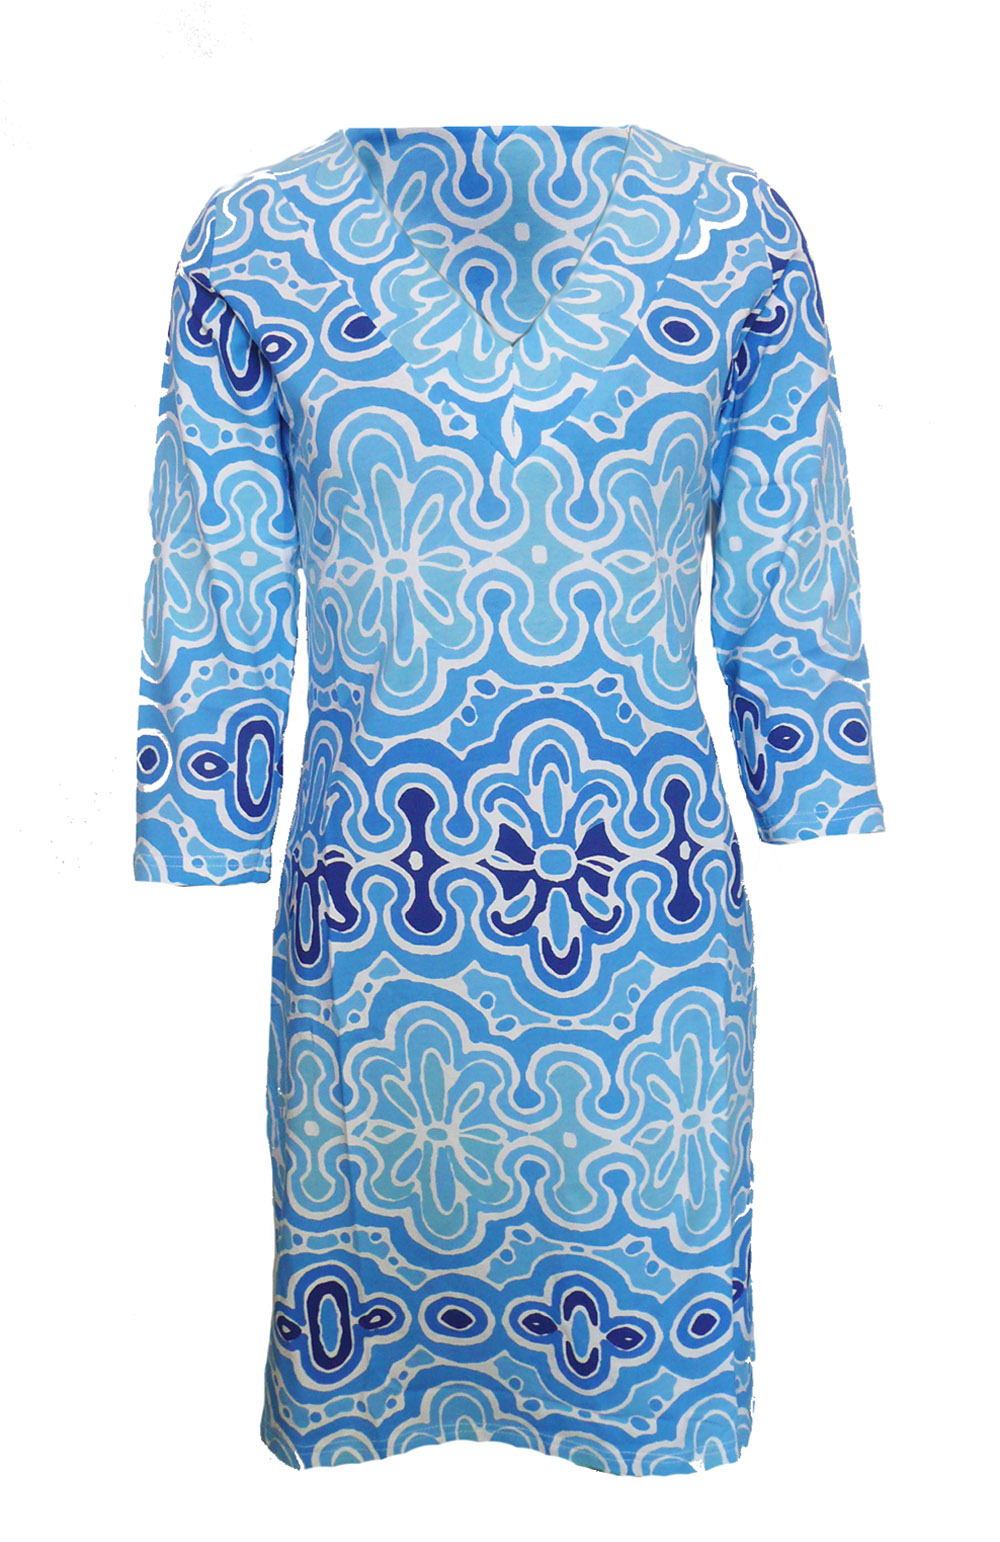 dress cotton prnt blue.jpg